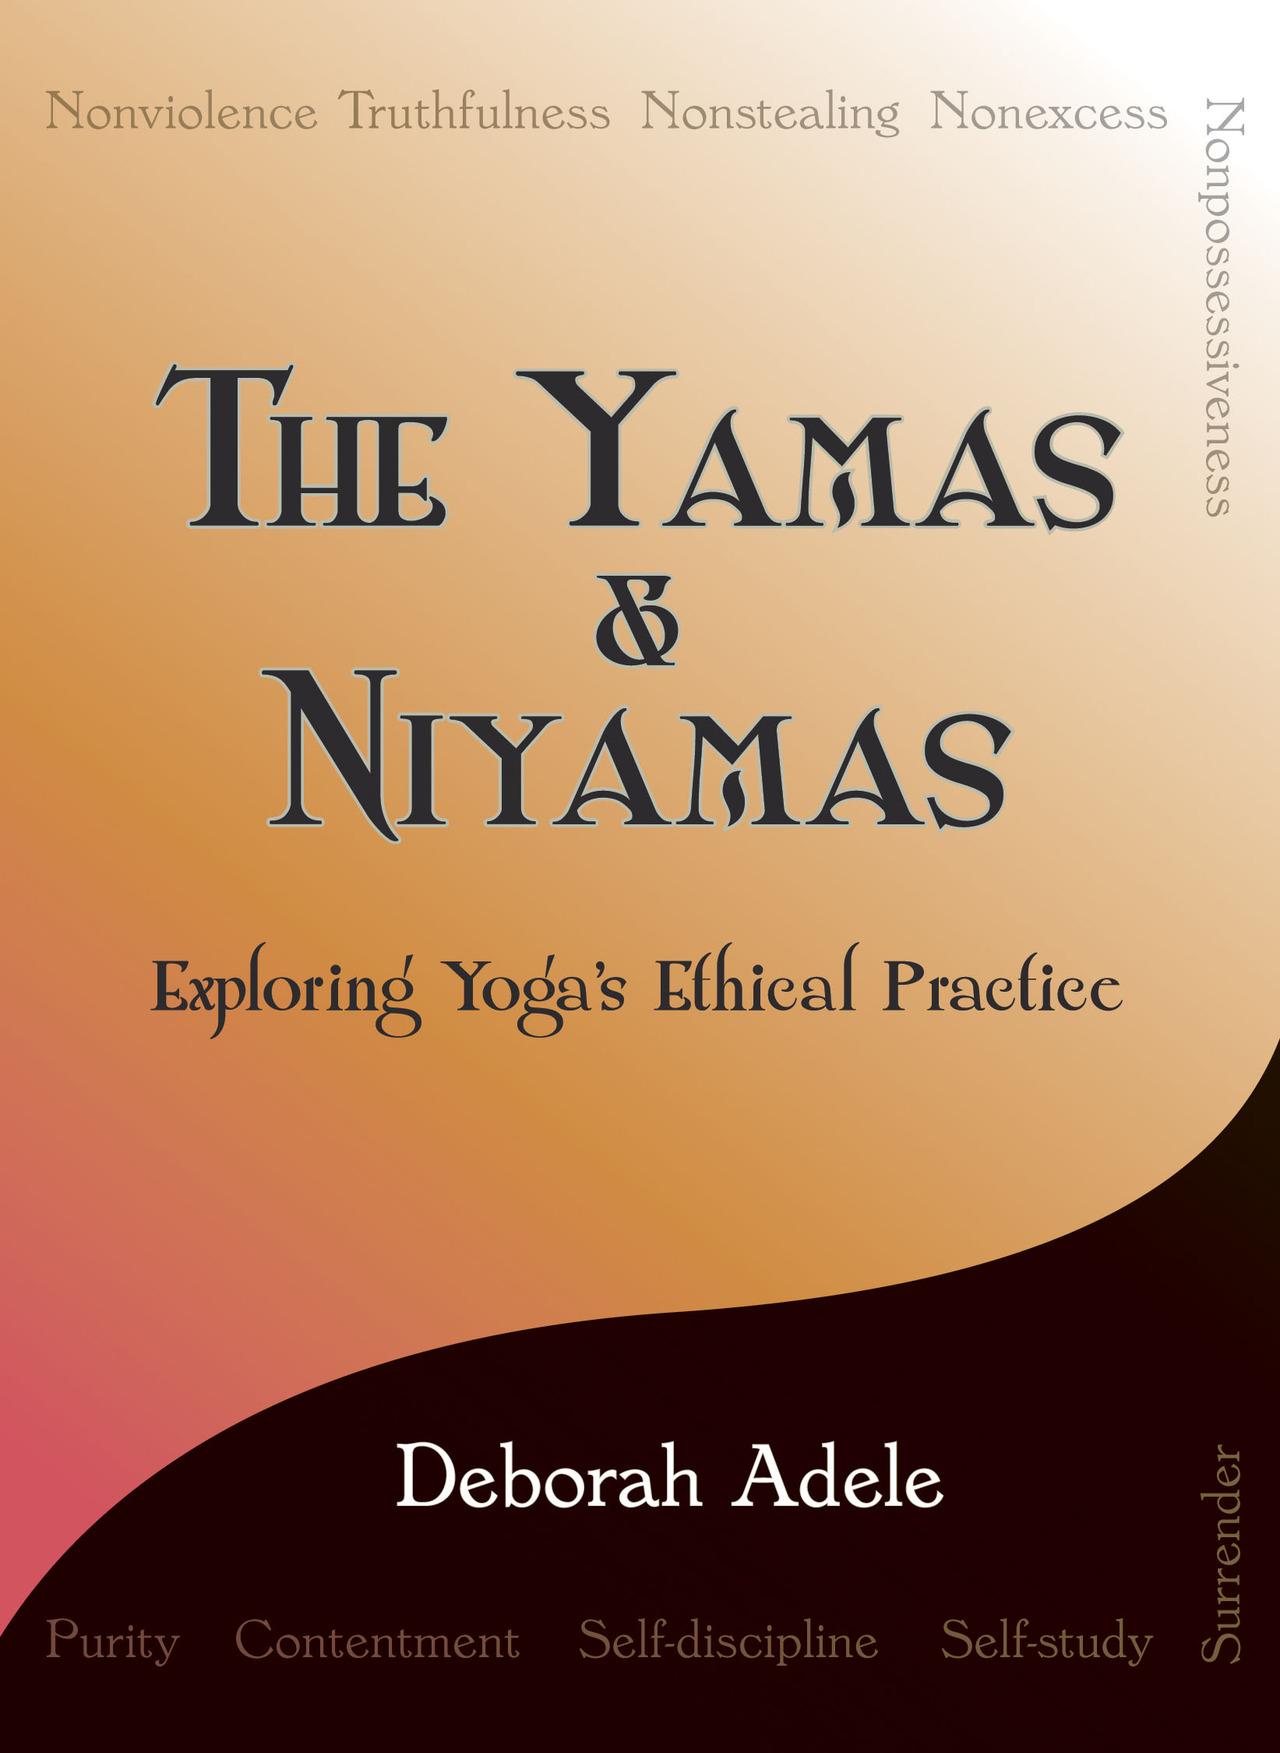 Yamas niyama frontcover300dpi